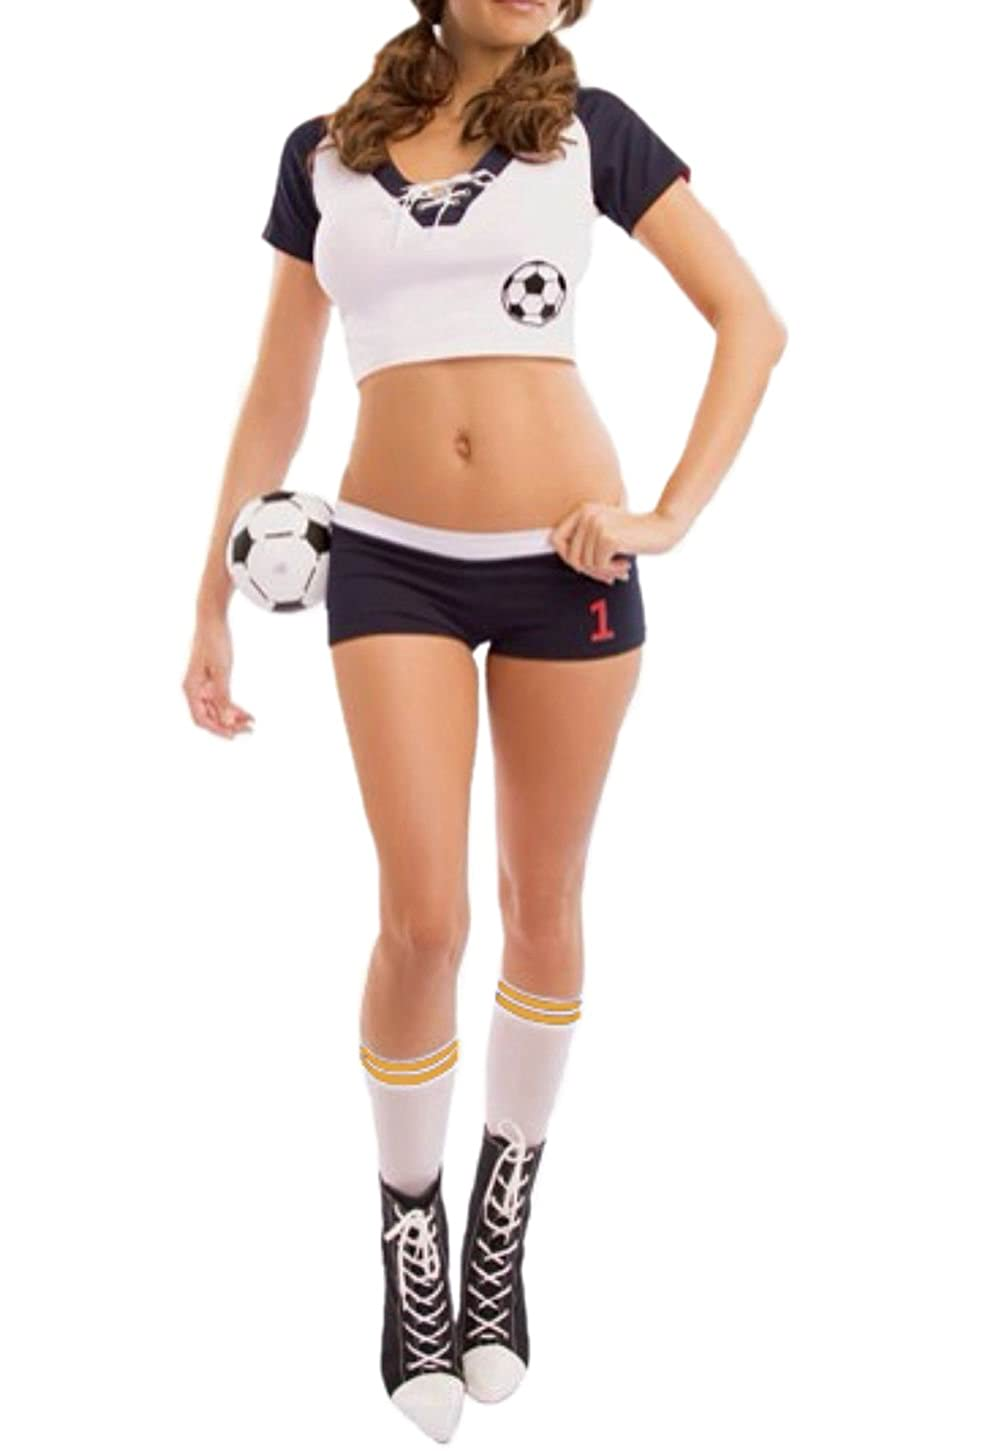 Sexy sport costumes